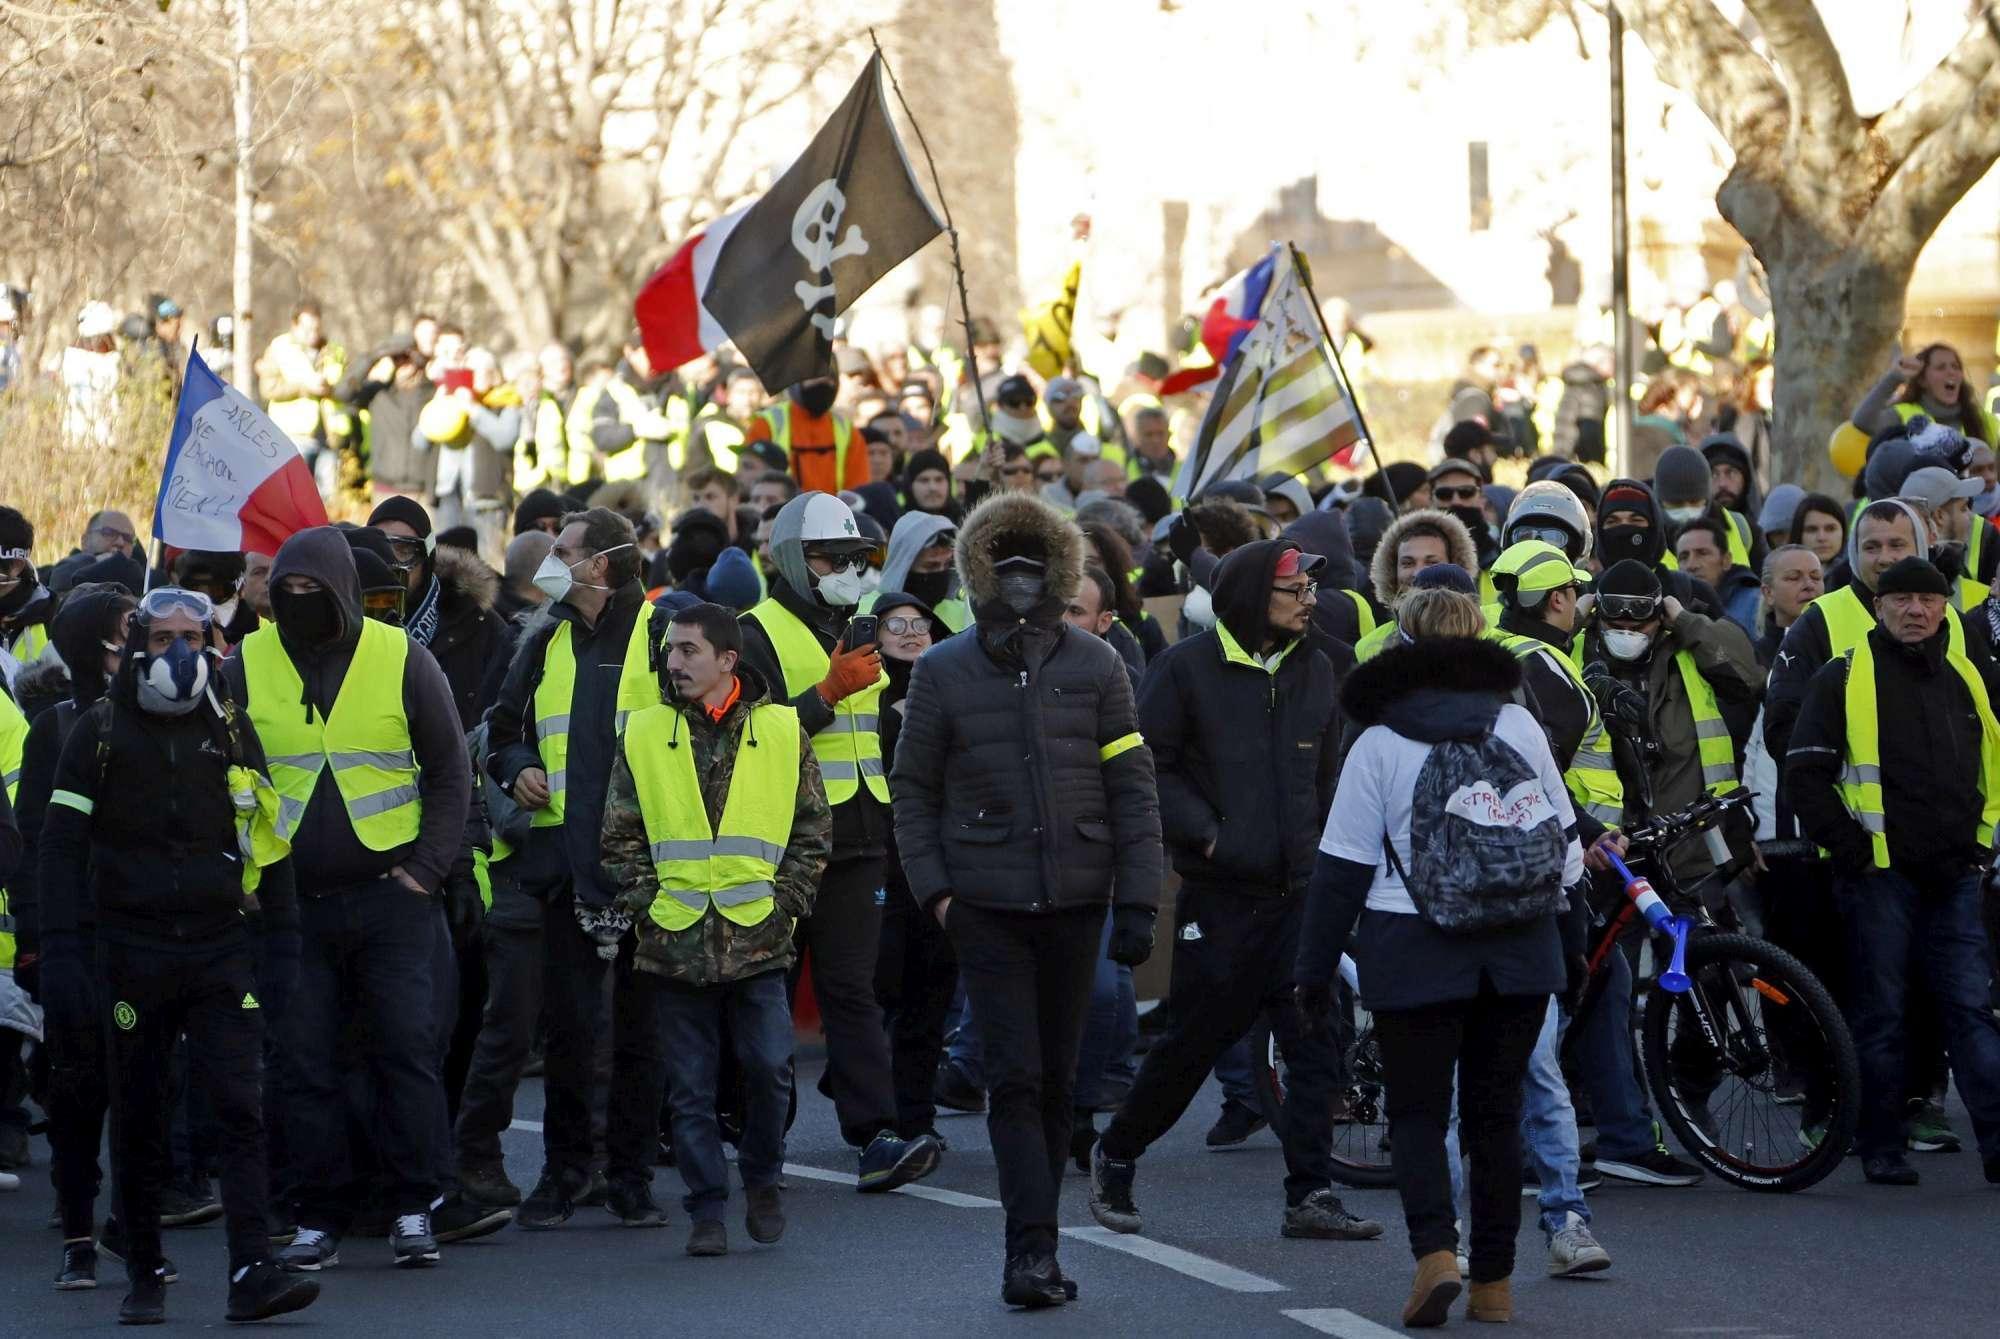 Nuova protesta dei gilet gialli a Parigi: scontri sugli Champs-Elysees